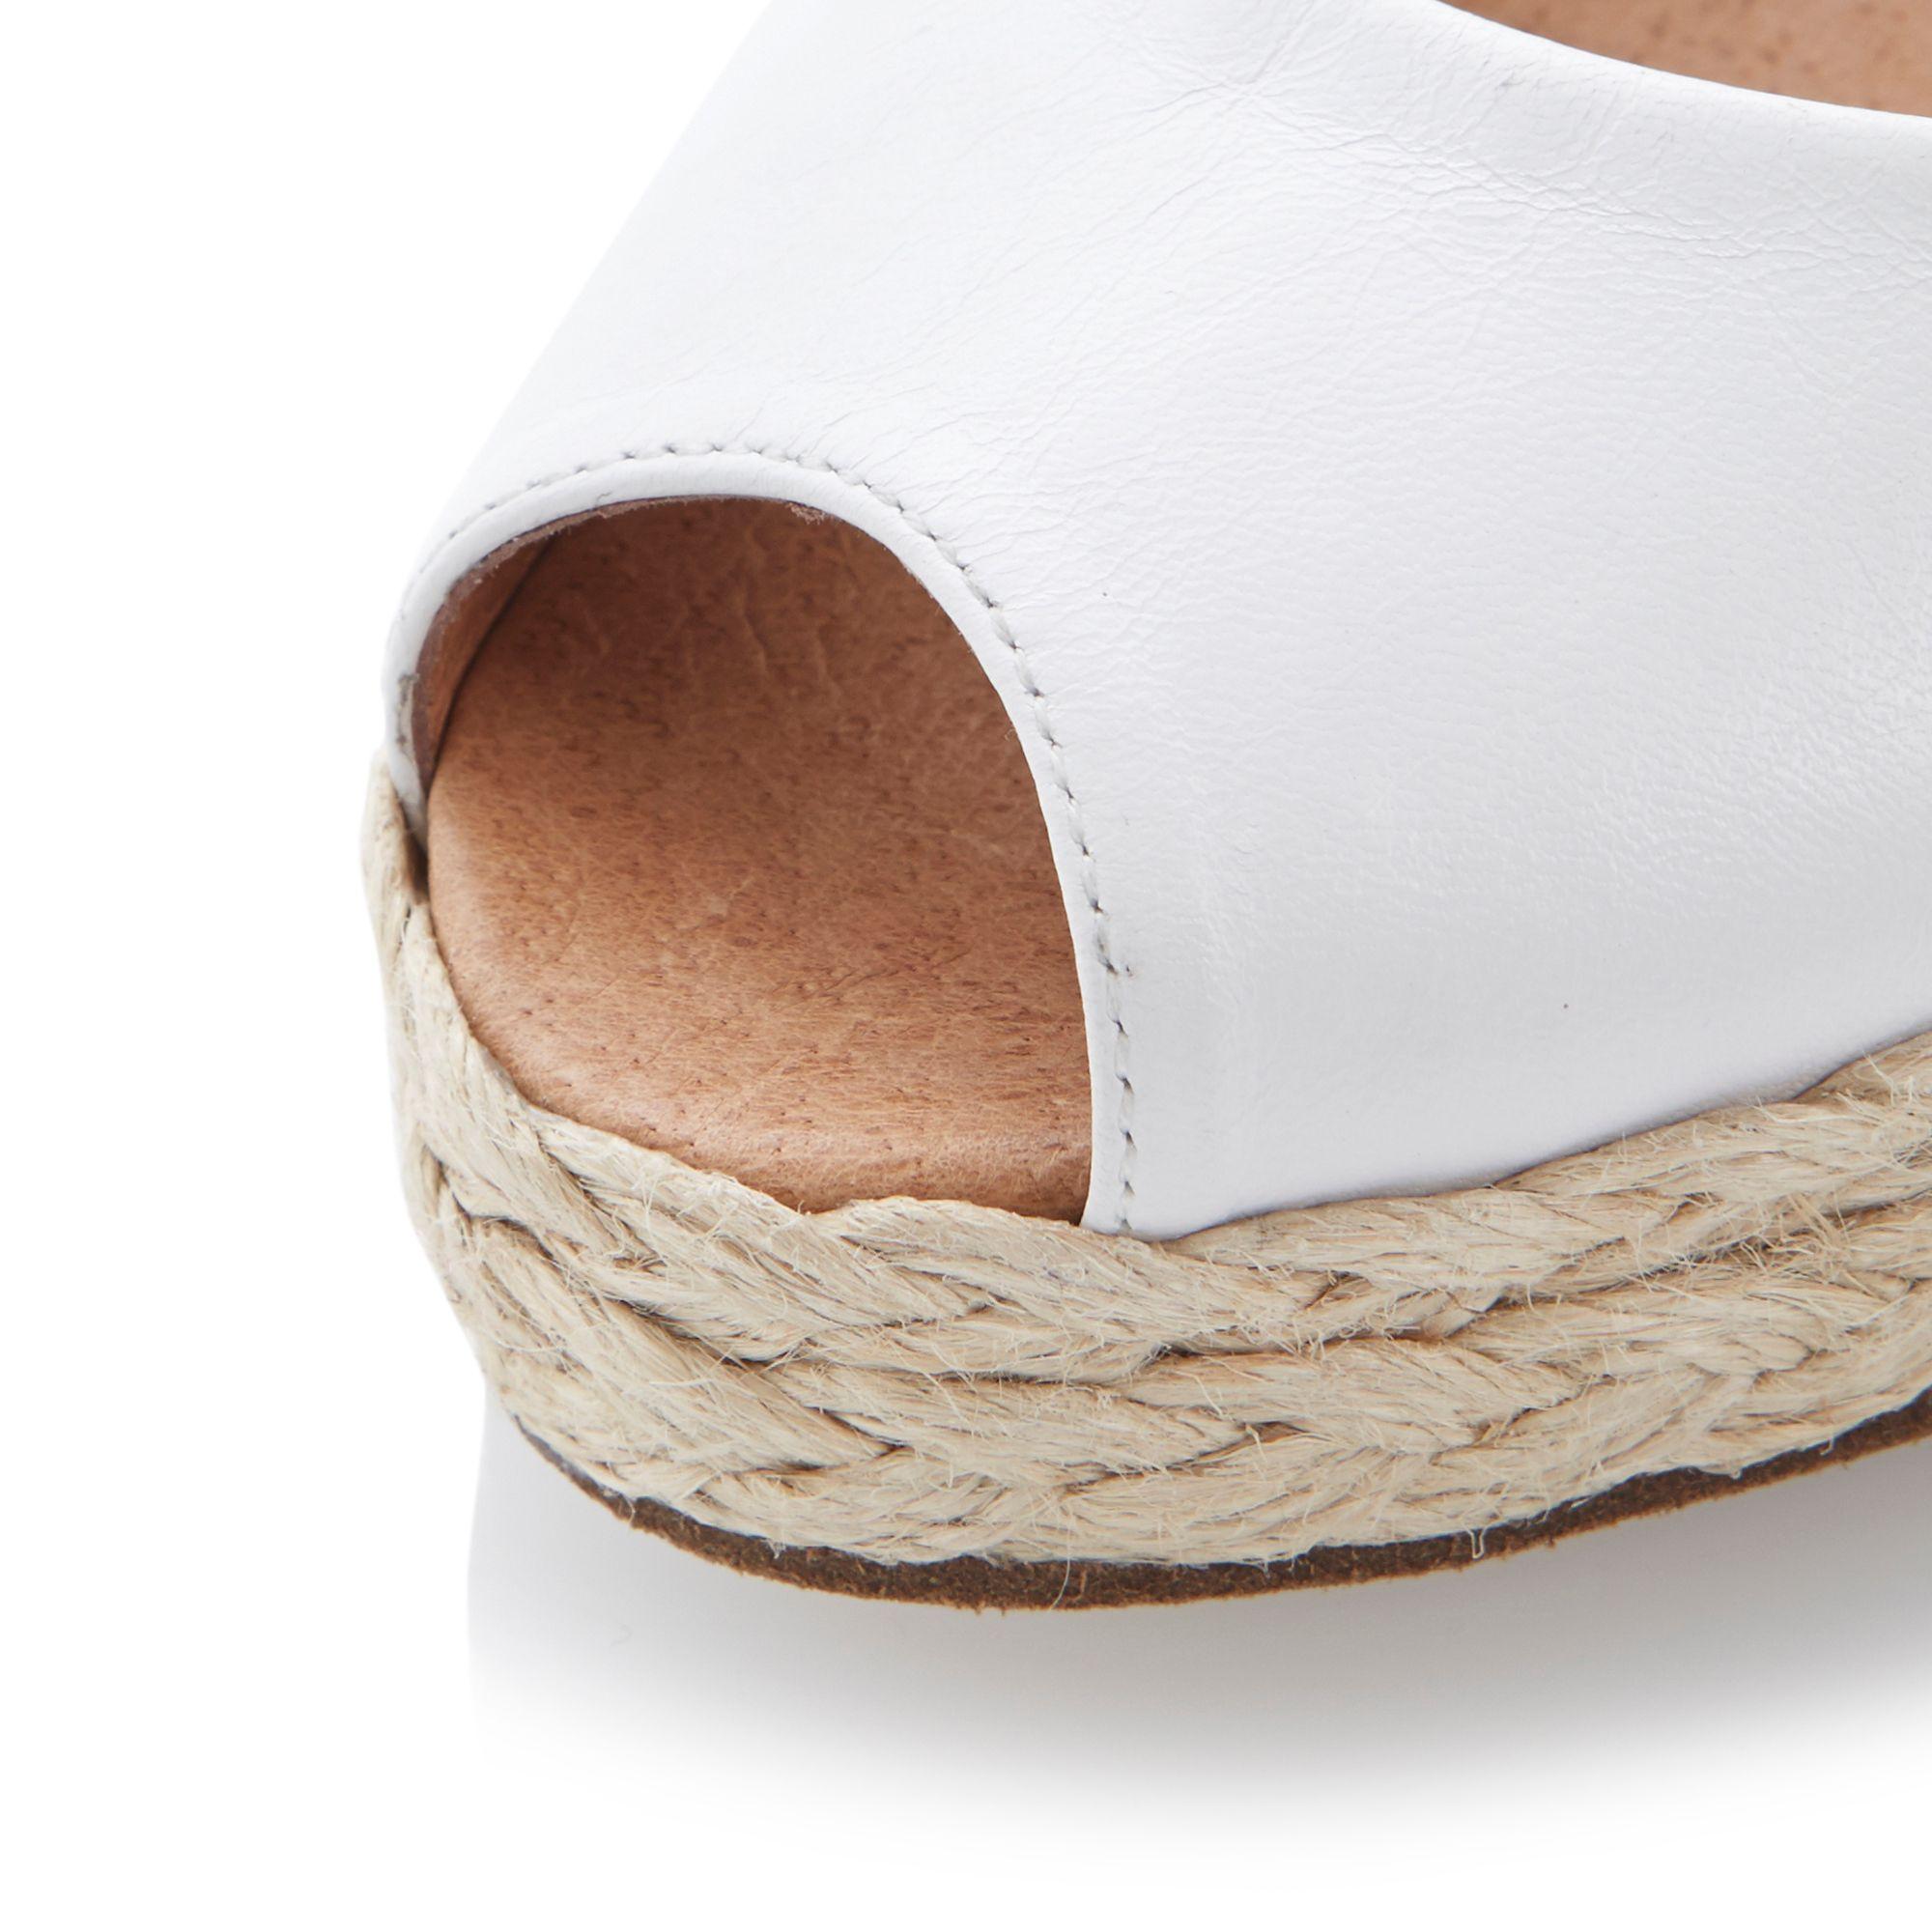 Blakc And White Peep Toe Sling Back Wedge Shoes